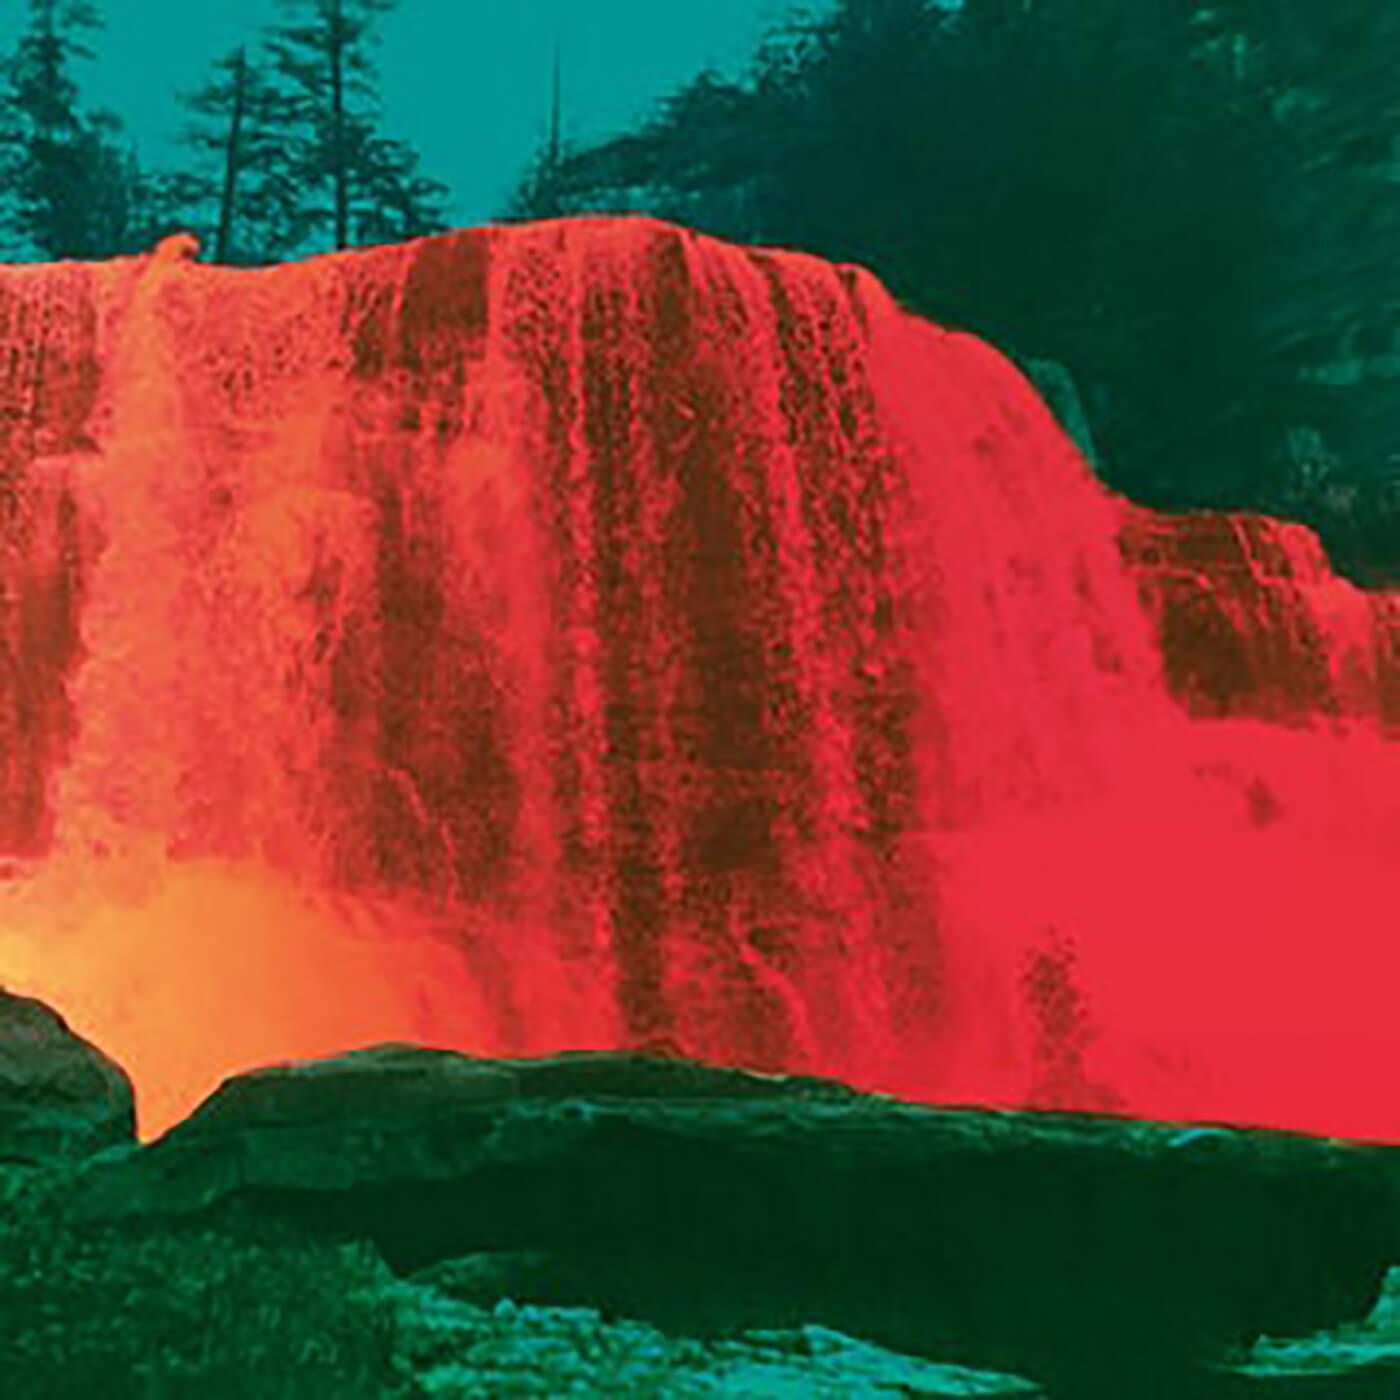 My Morning Jacket (Jim James) - The Waterfall II